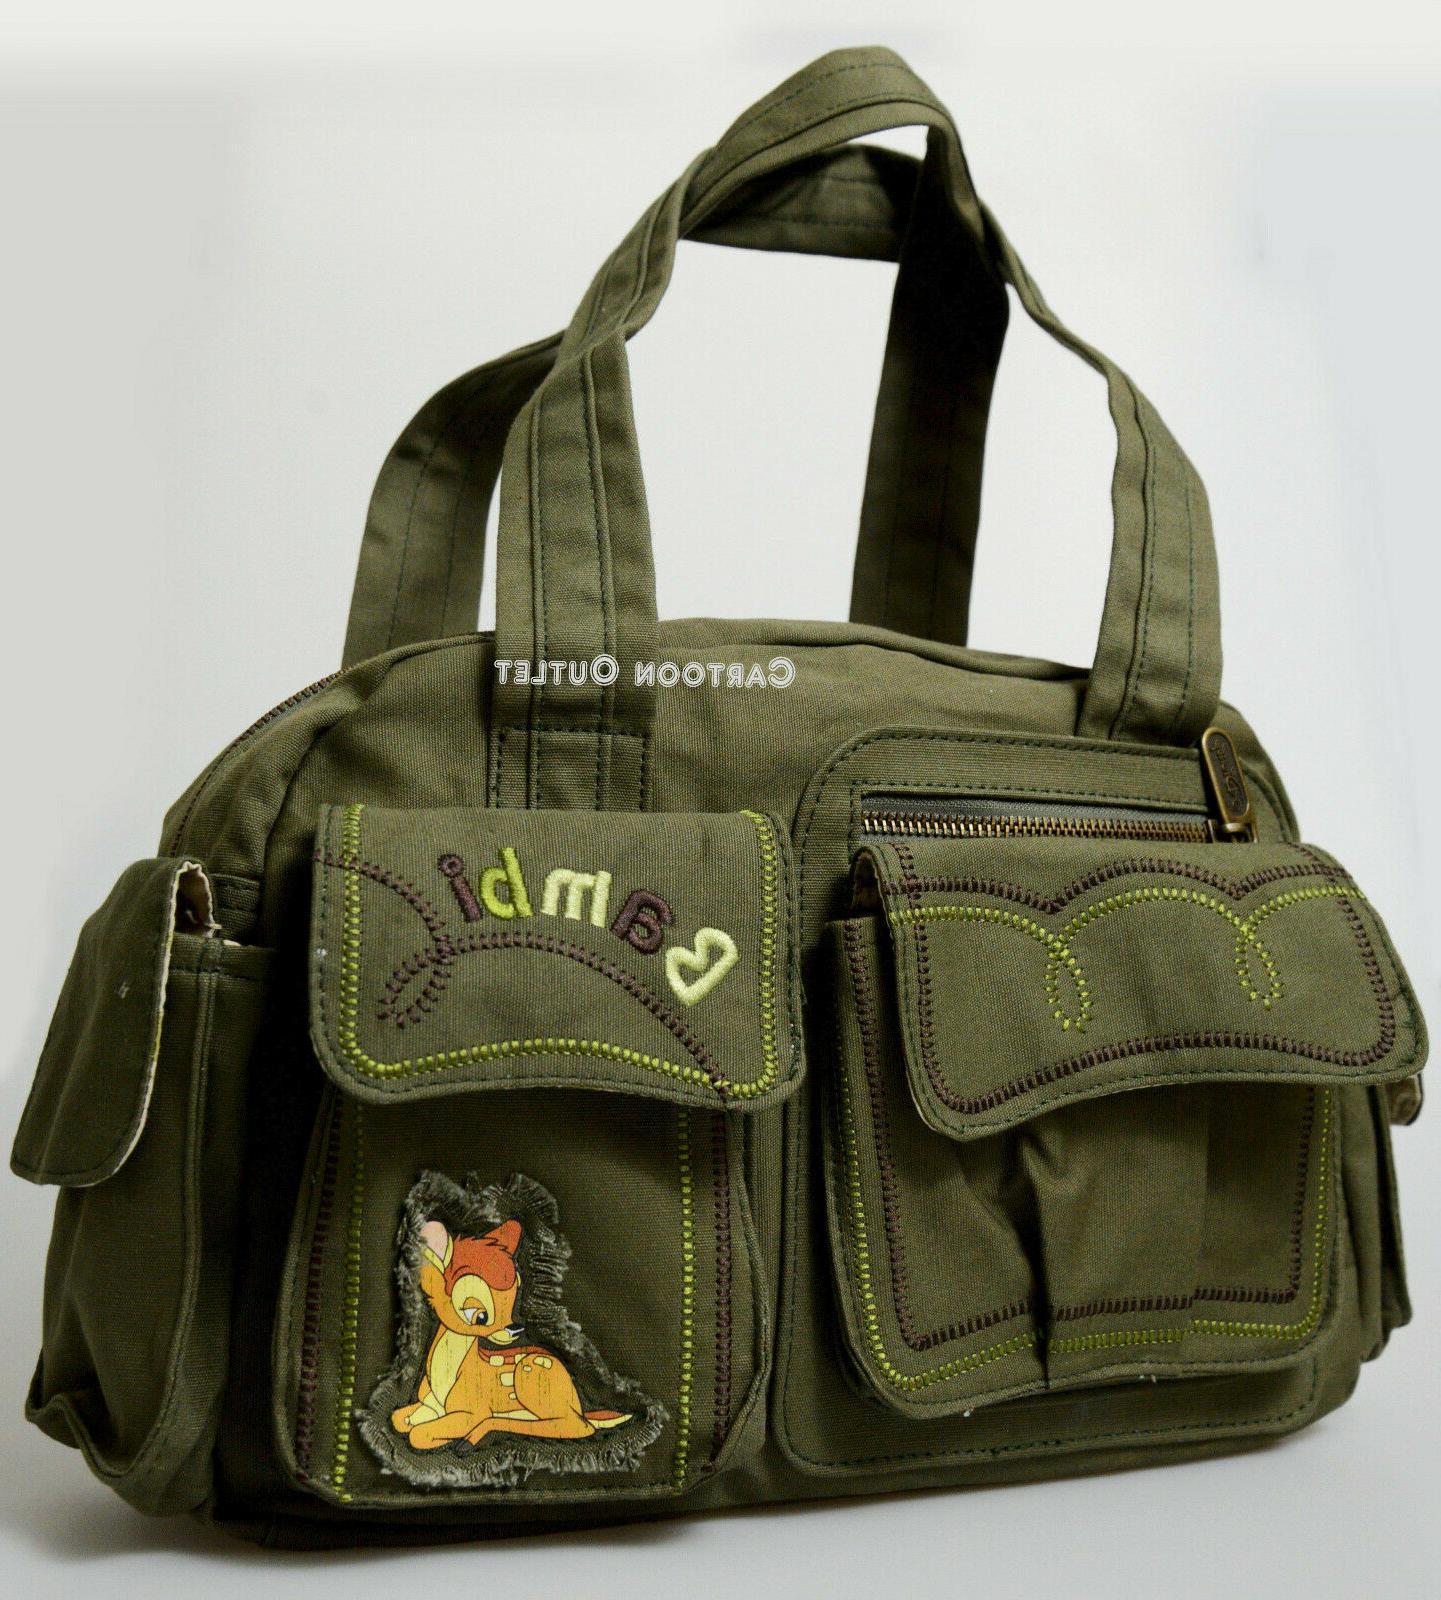 bambi purse handbag canvas green birthday gift